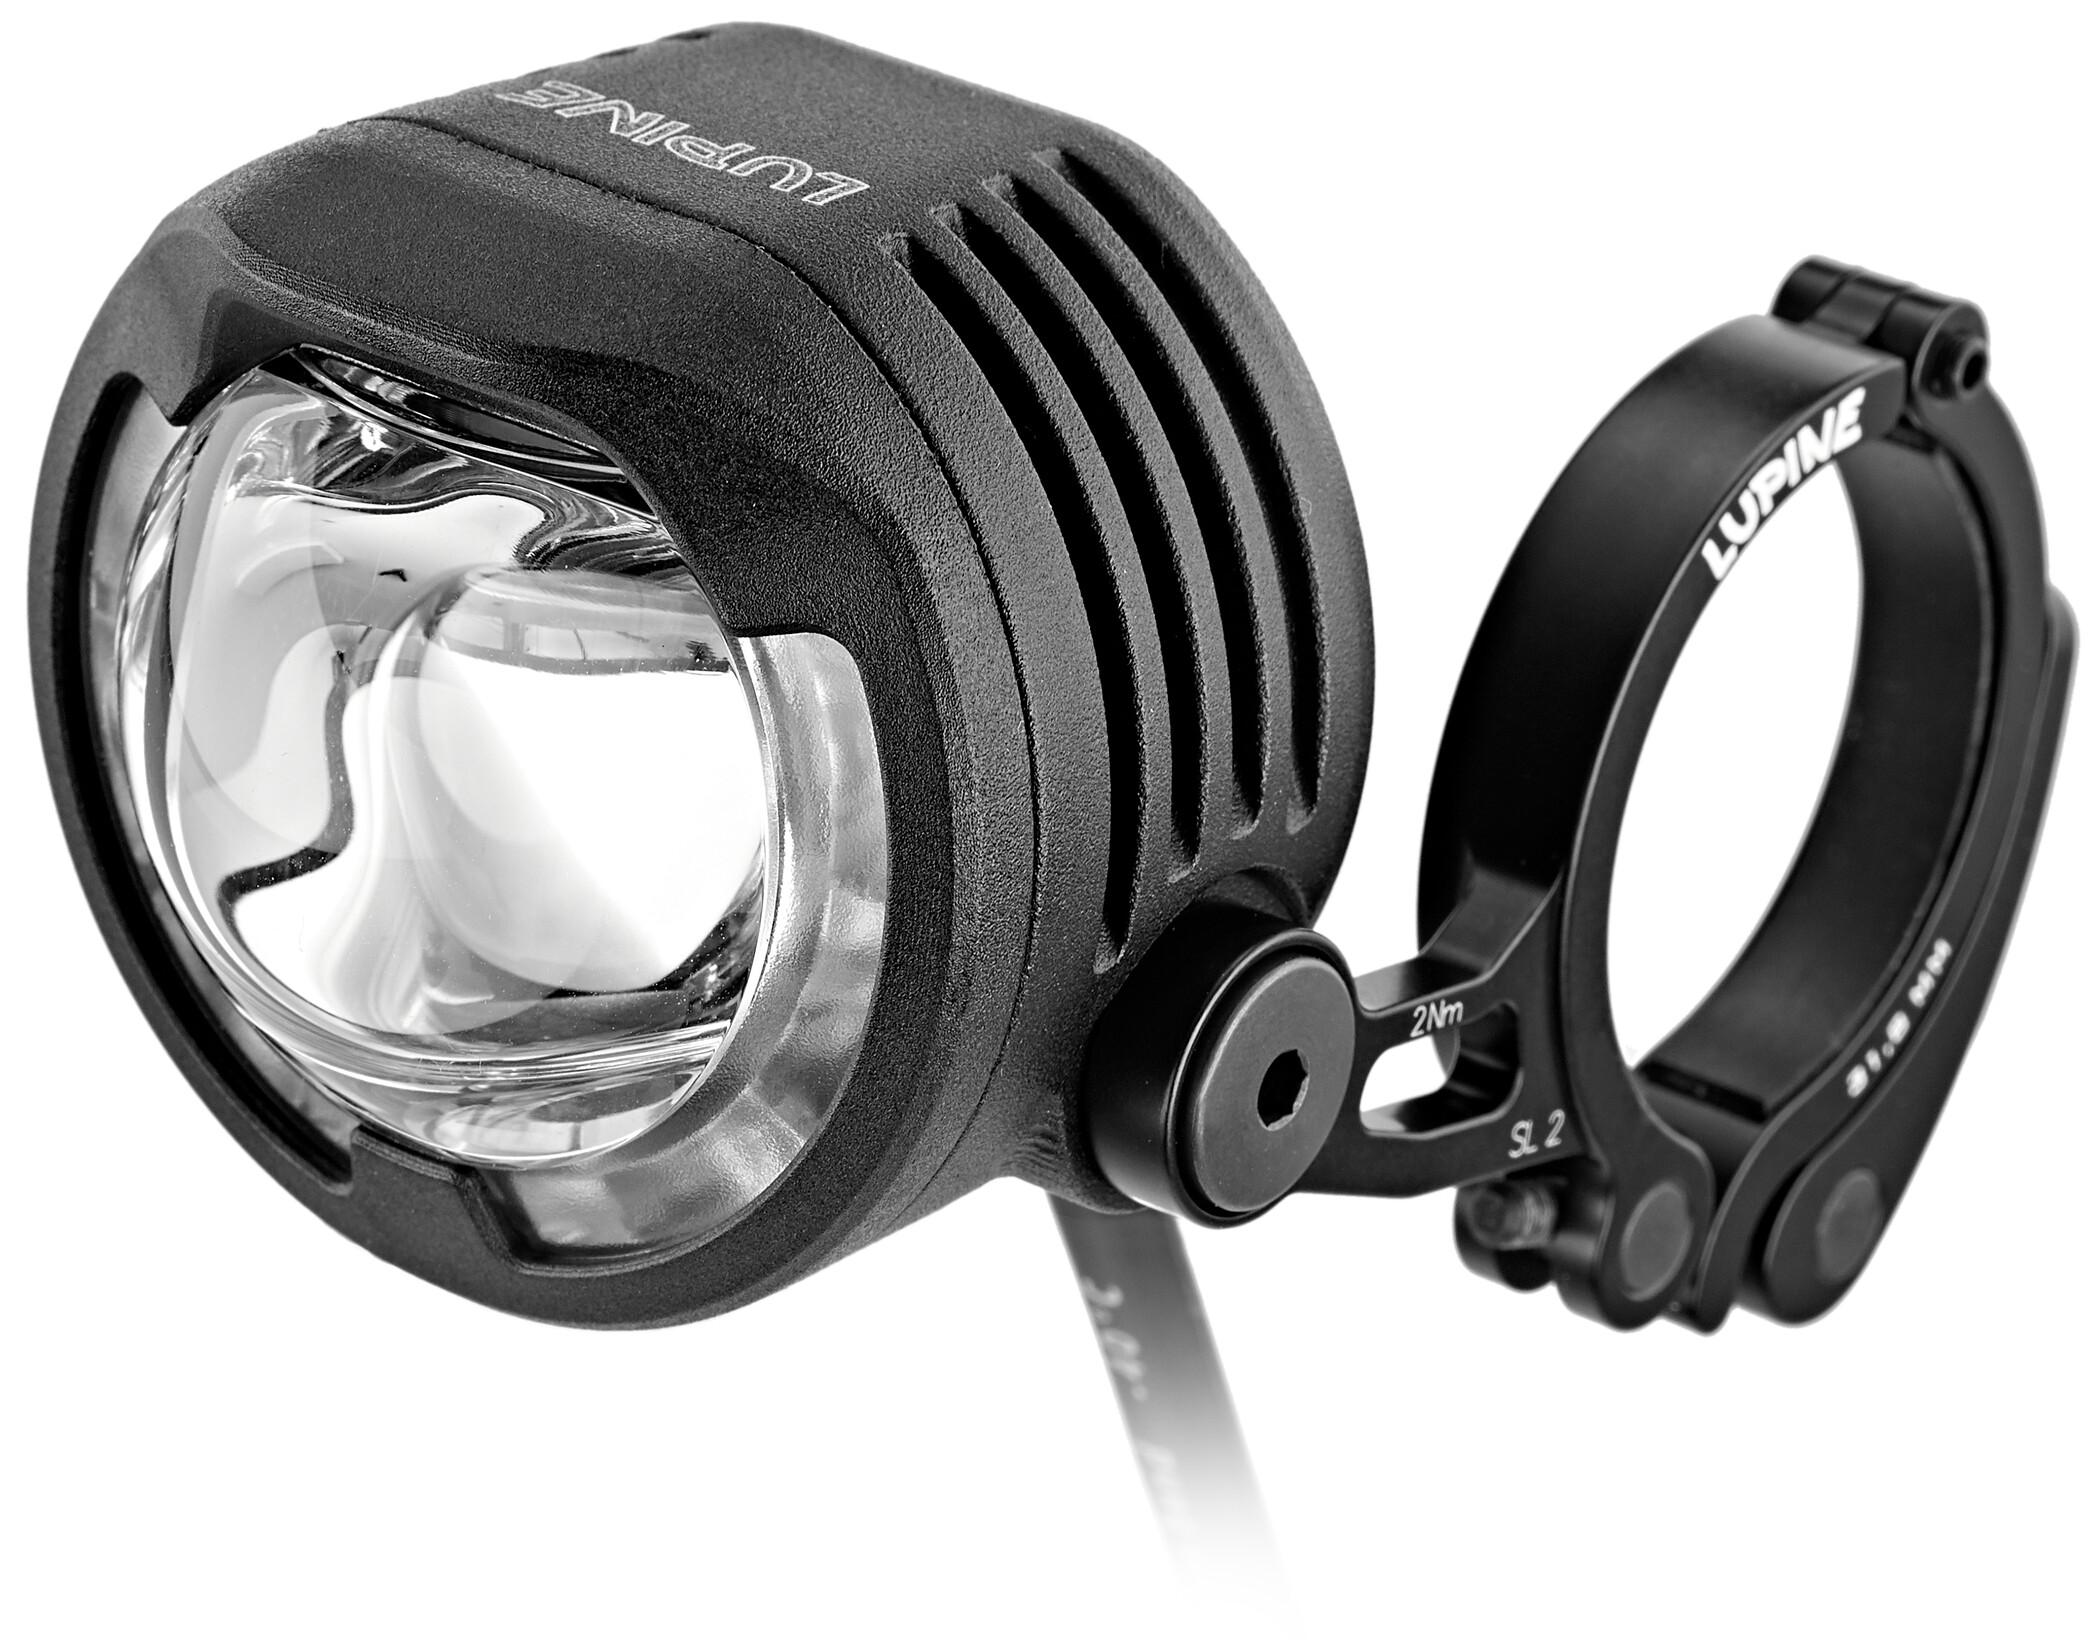 KNOG BOOMER /'12 Red 1 White LED Bike Headlight 25 Lumen 4 Mode 600m NEW